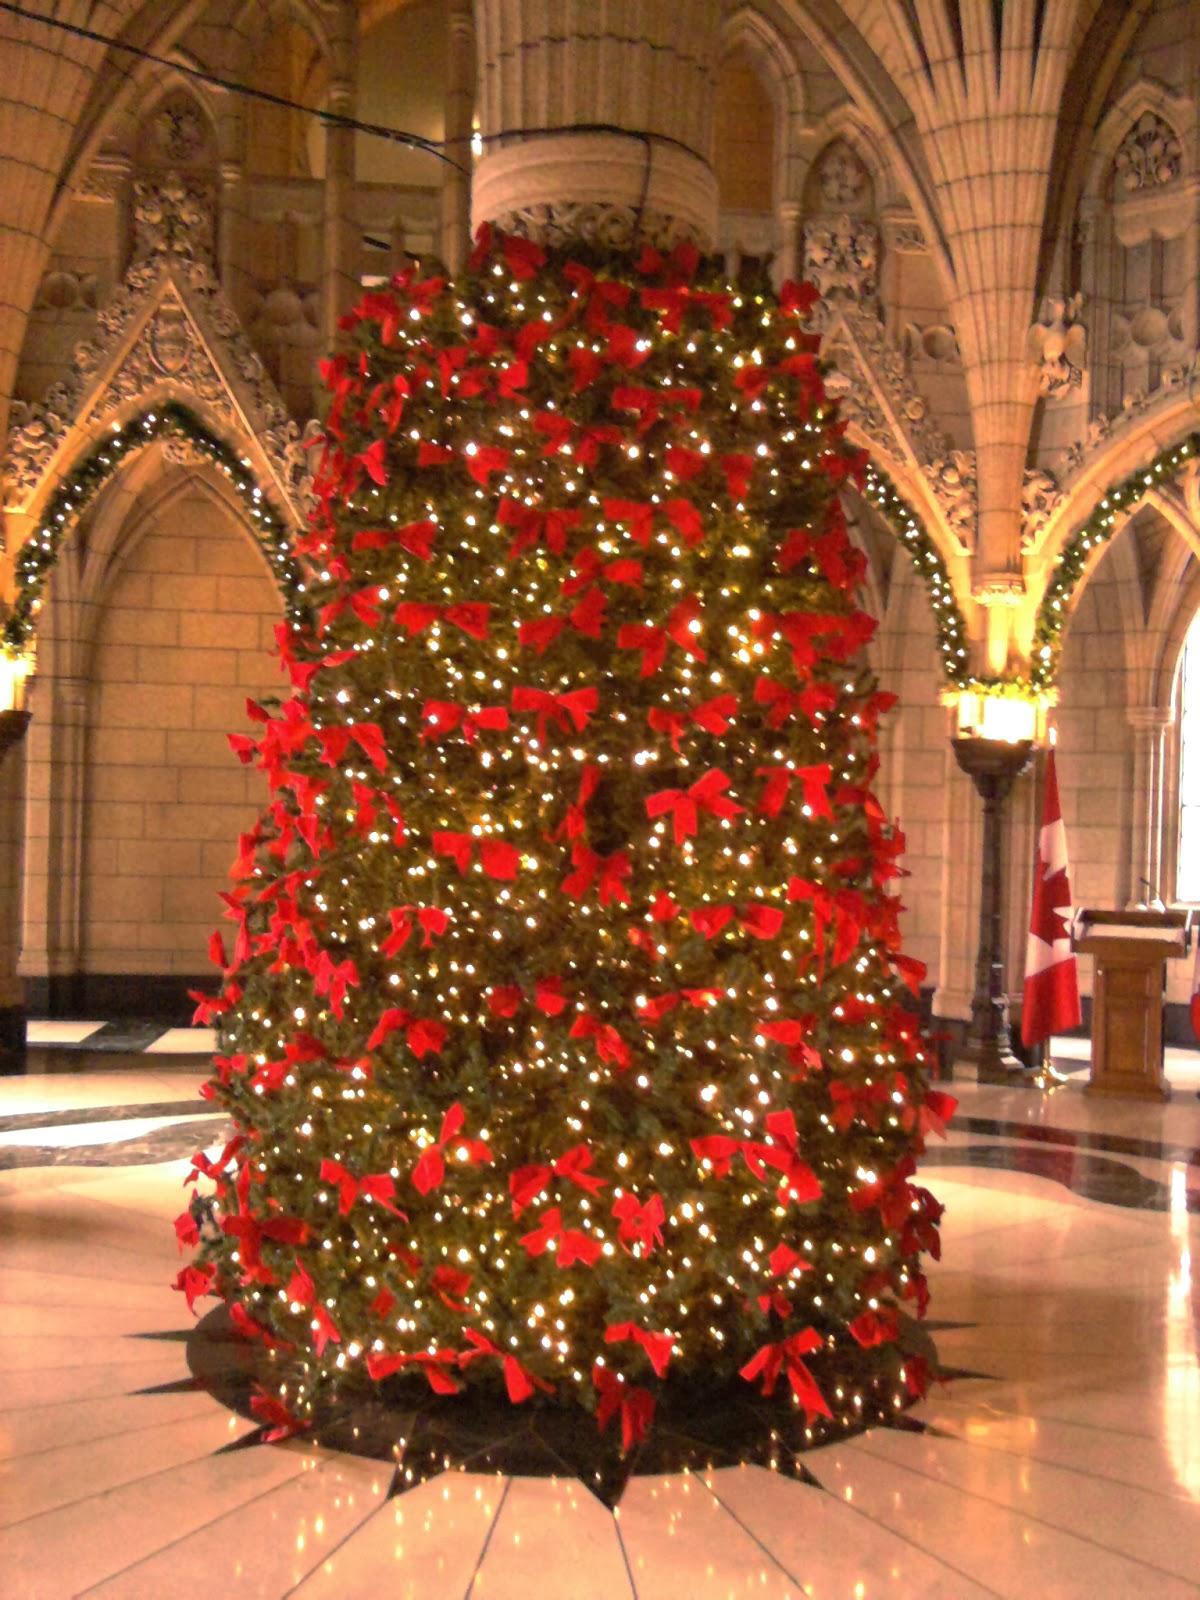 Ottawa Daily Twas The Night Before Christmas